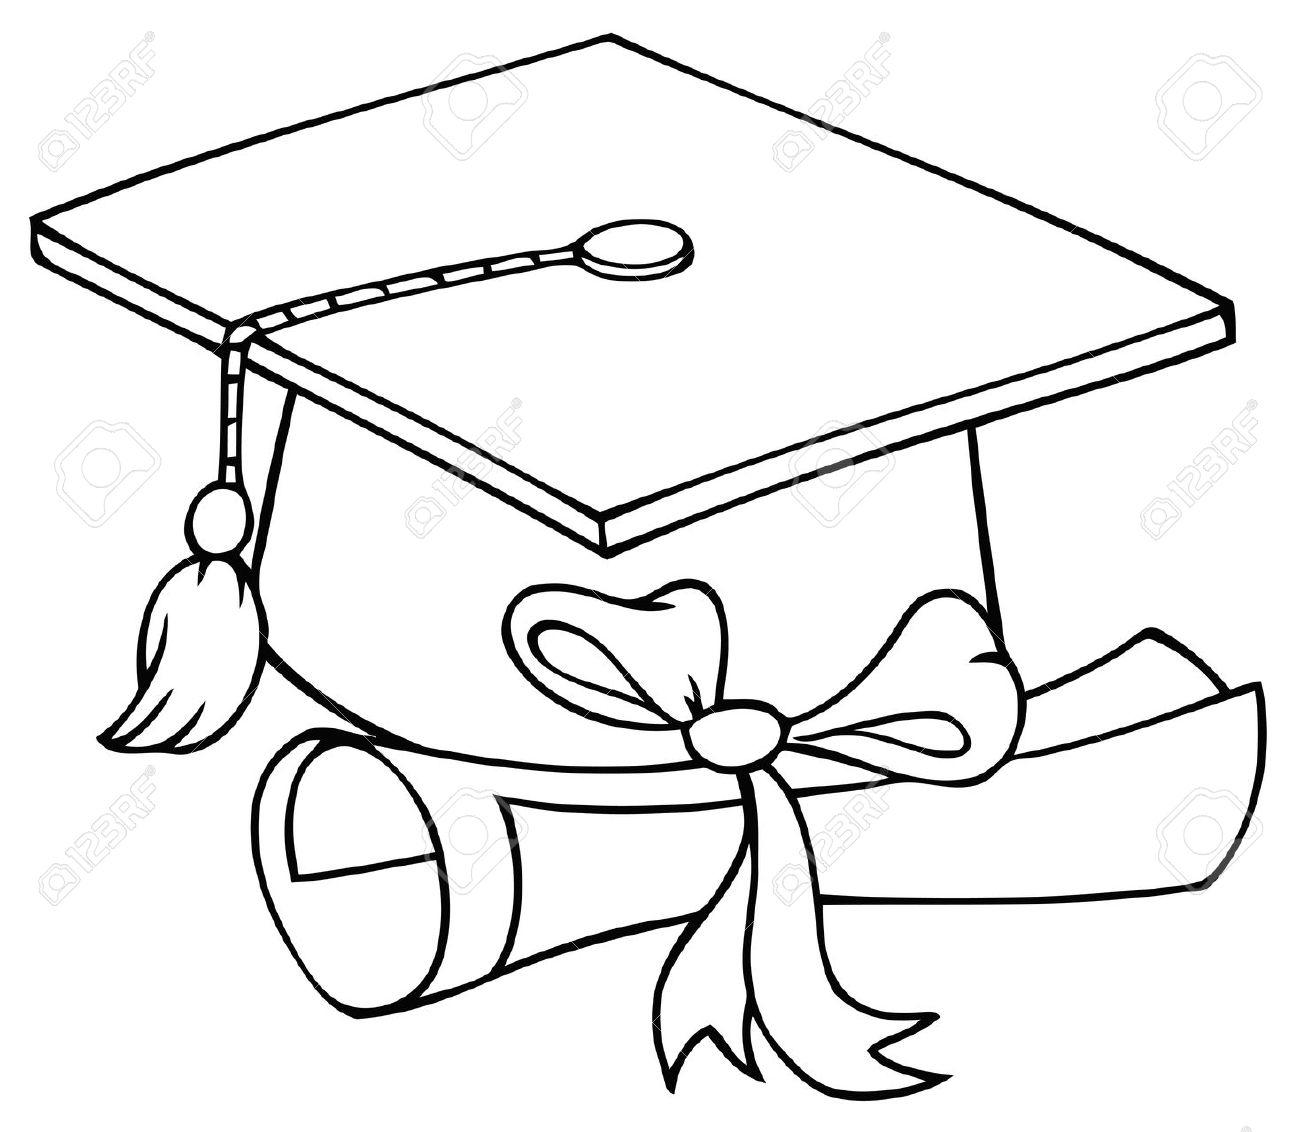 1300x1132 Top 77 Diploma Clip Art